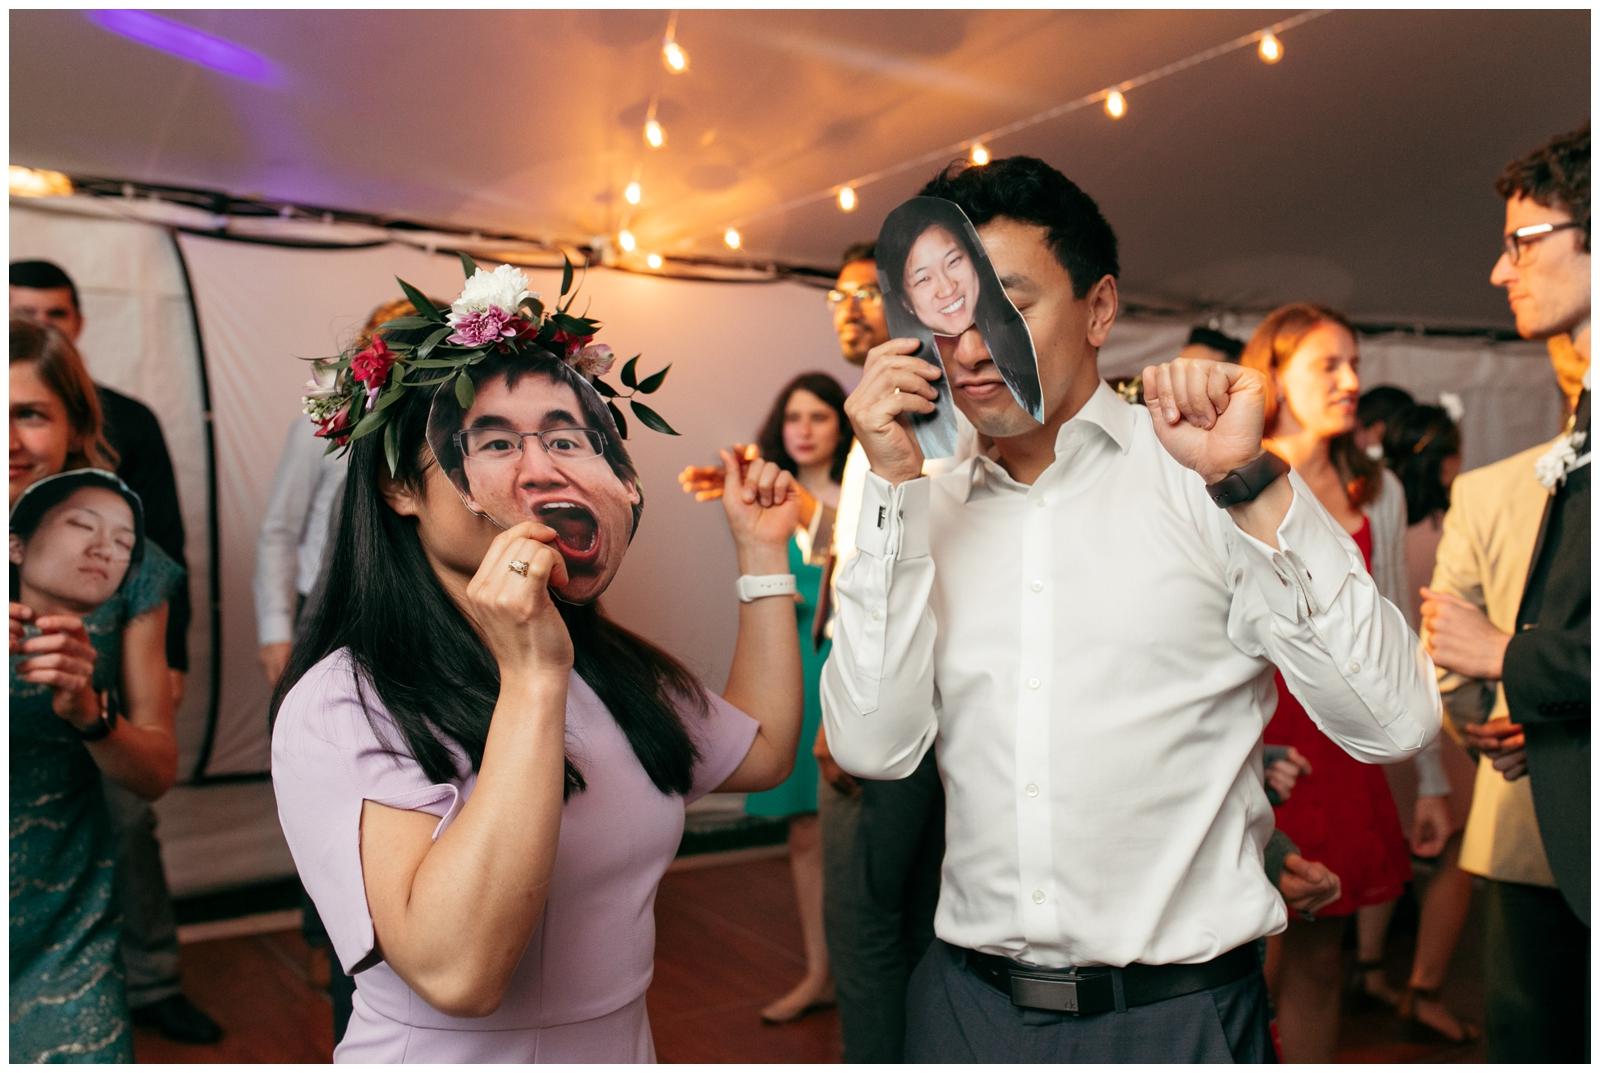 Berkshires wedding photos